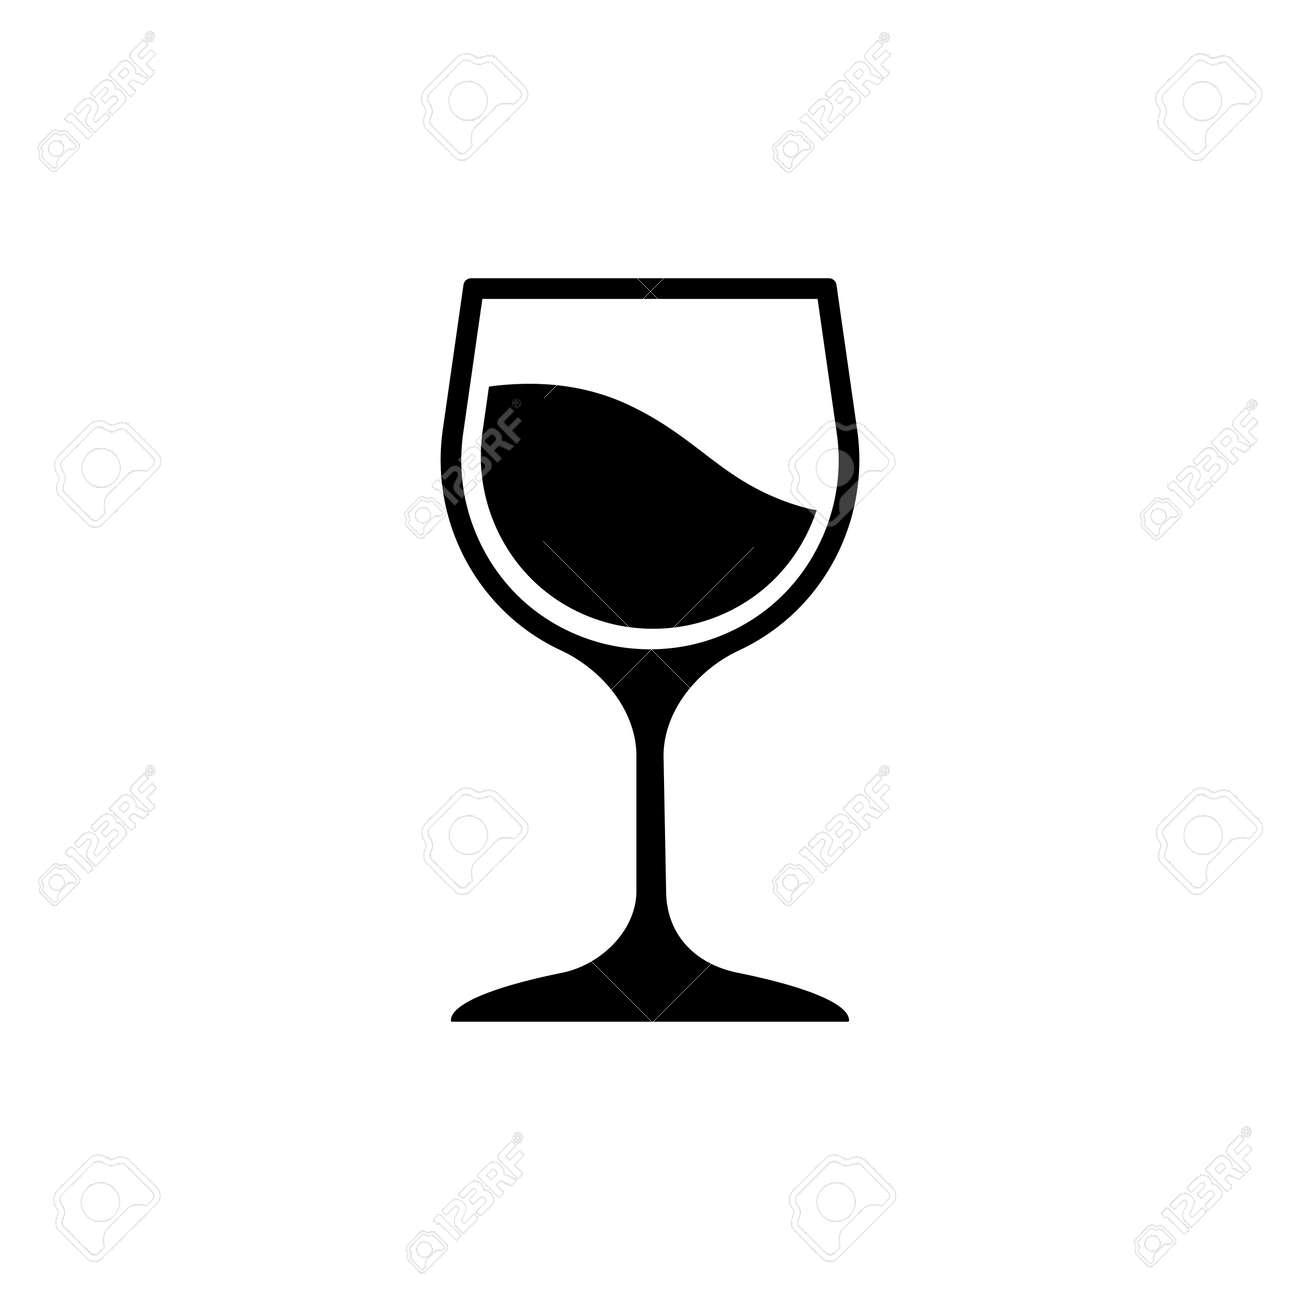 Glass of wine icon logo design black symbol isolated on white background. Vector EPS 10 - 145281789